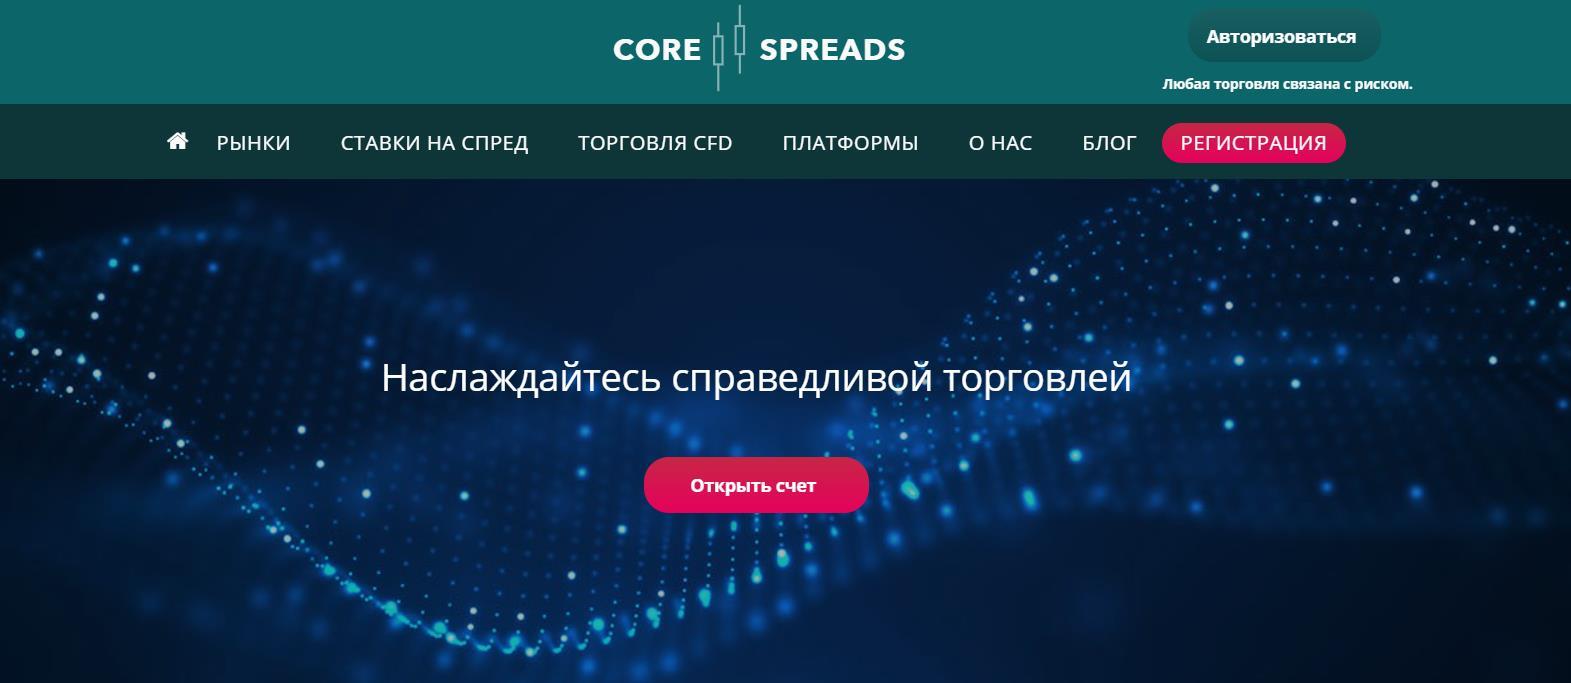 официальный сайт core spreads